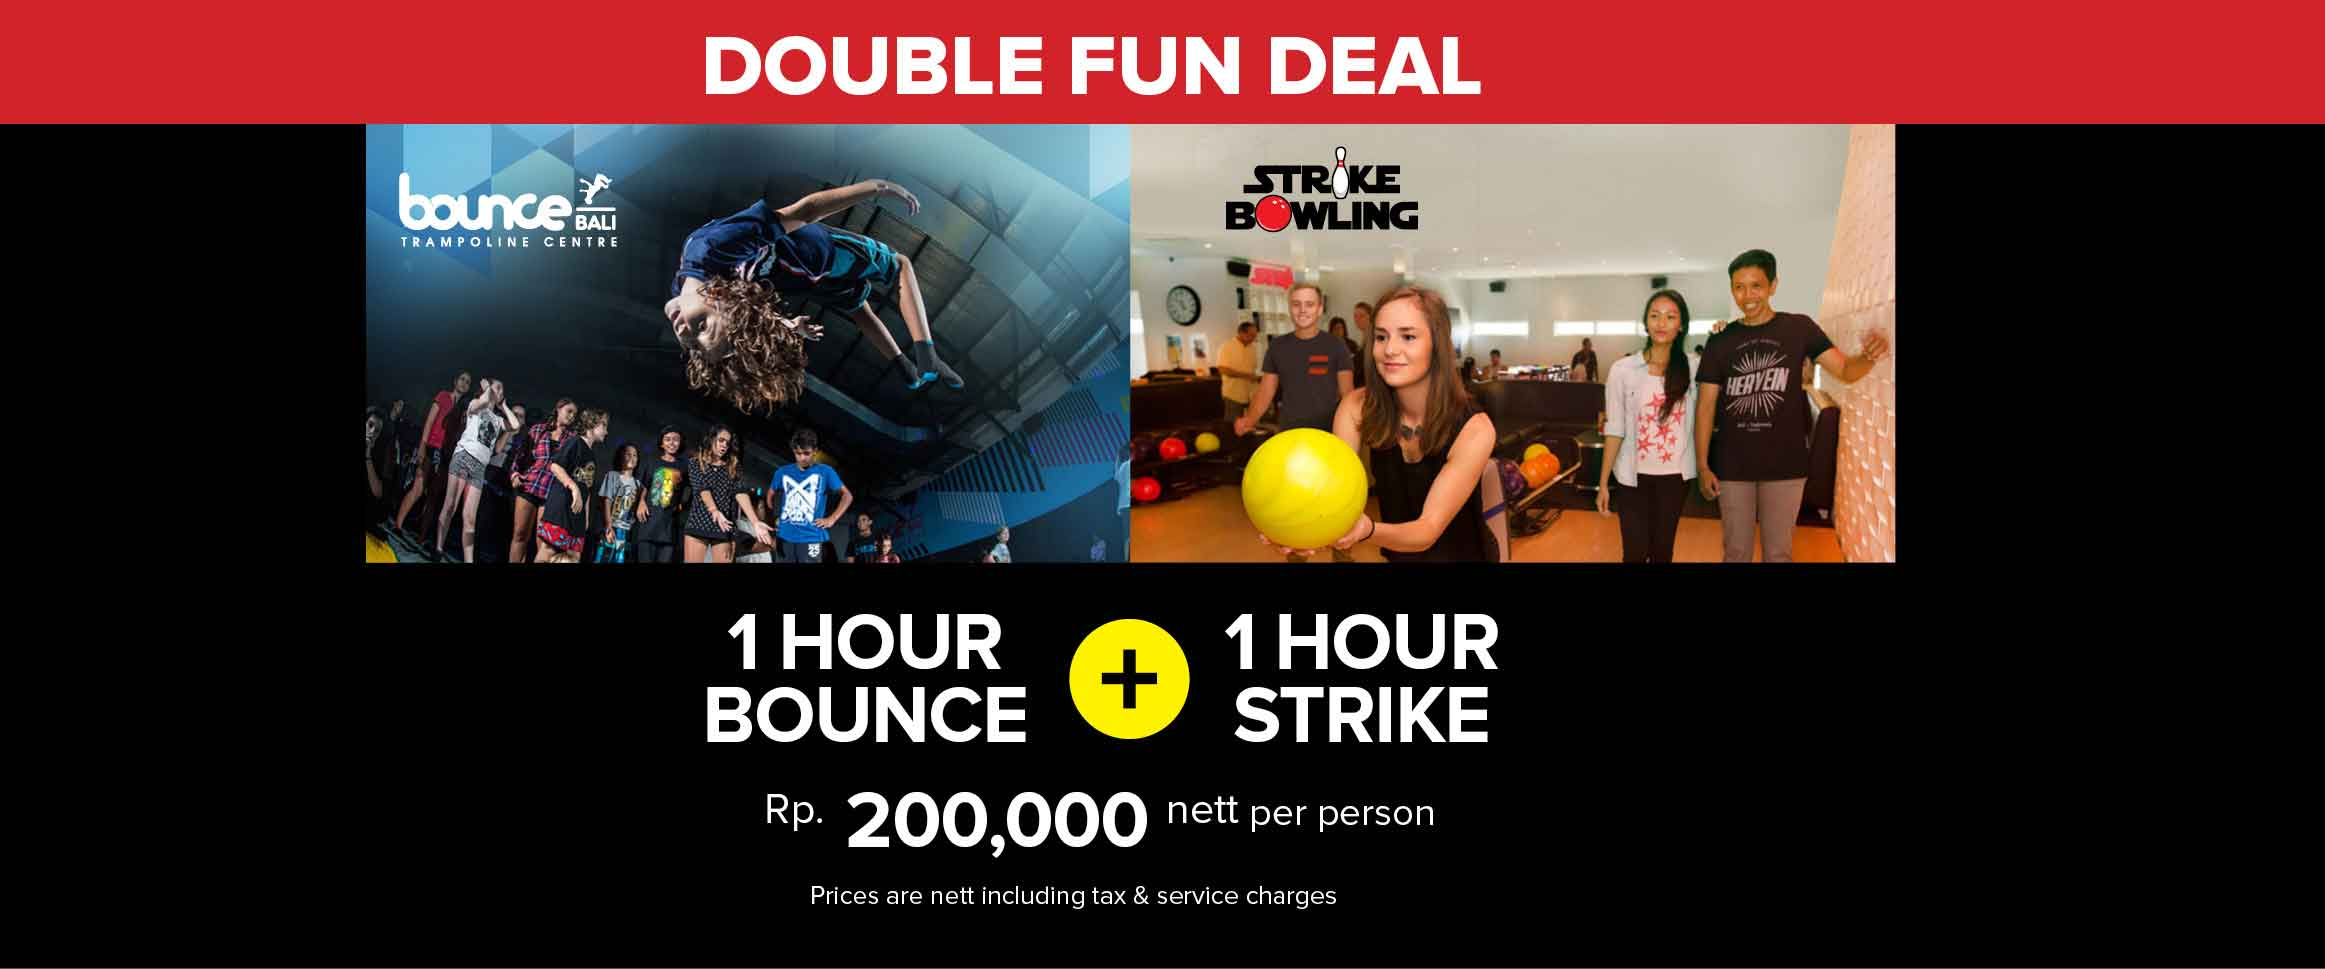 2017-529-slide-double-fun-deal